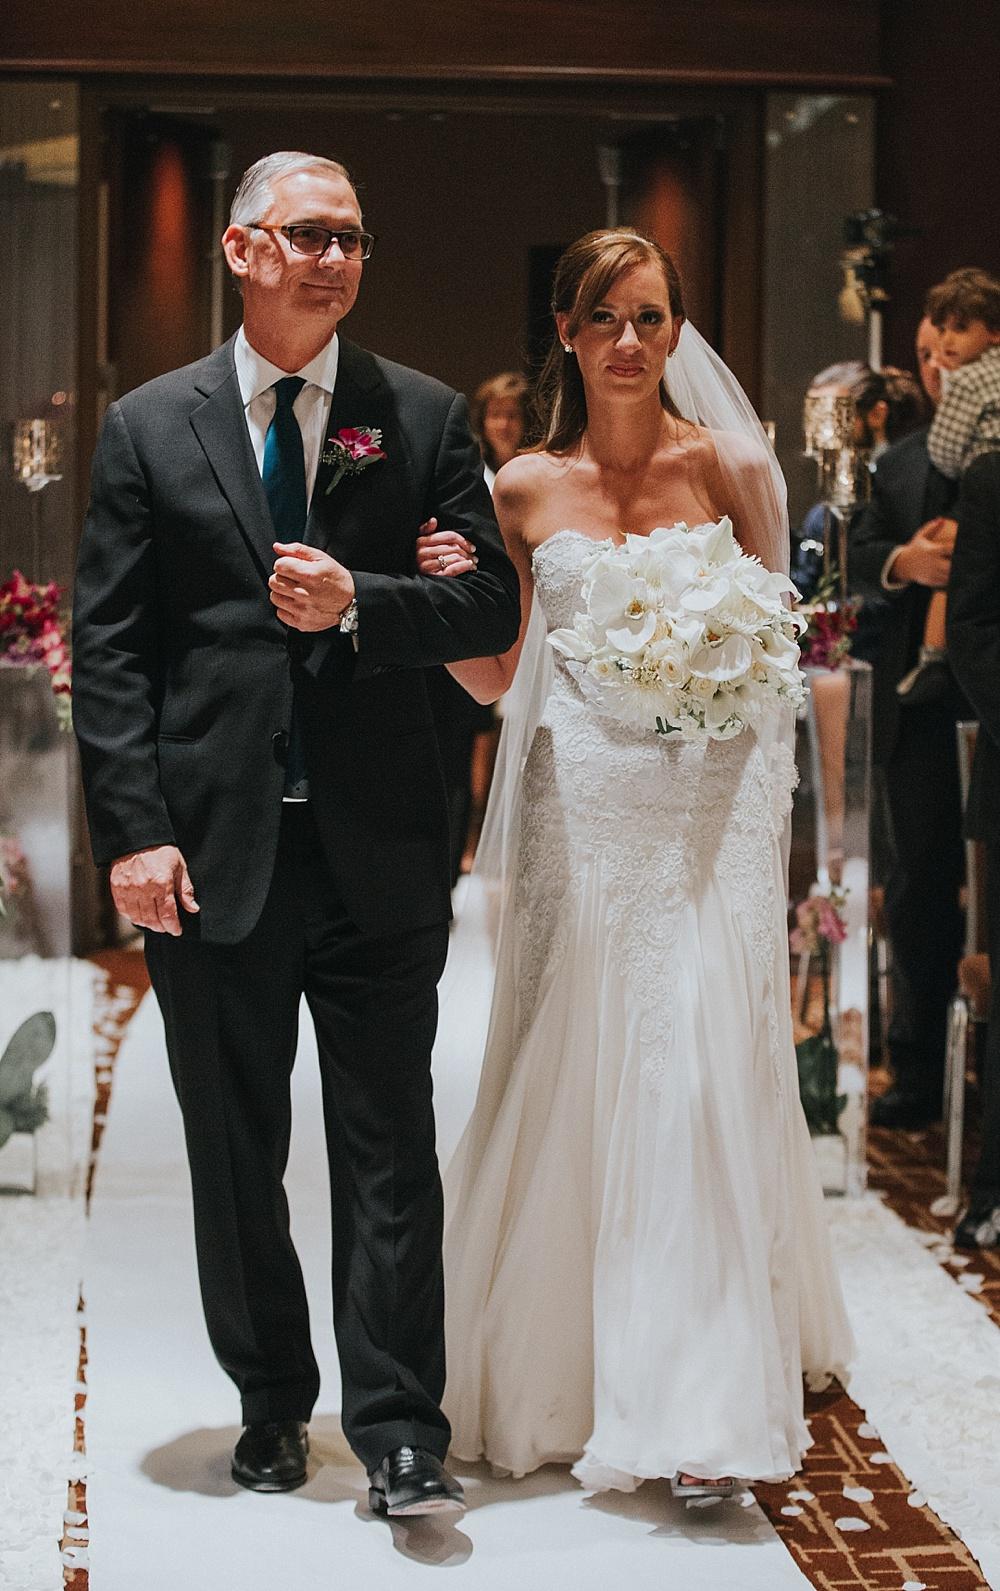 Steven-Katy_Intercontinental-Milwaukee-Wedding-Photographer-Liller-Photo_0054.jpg